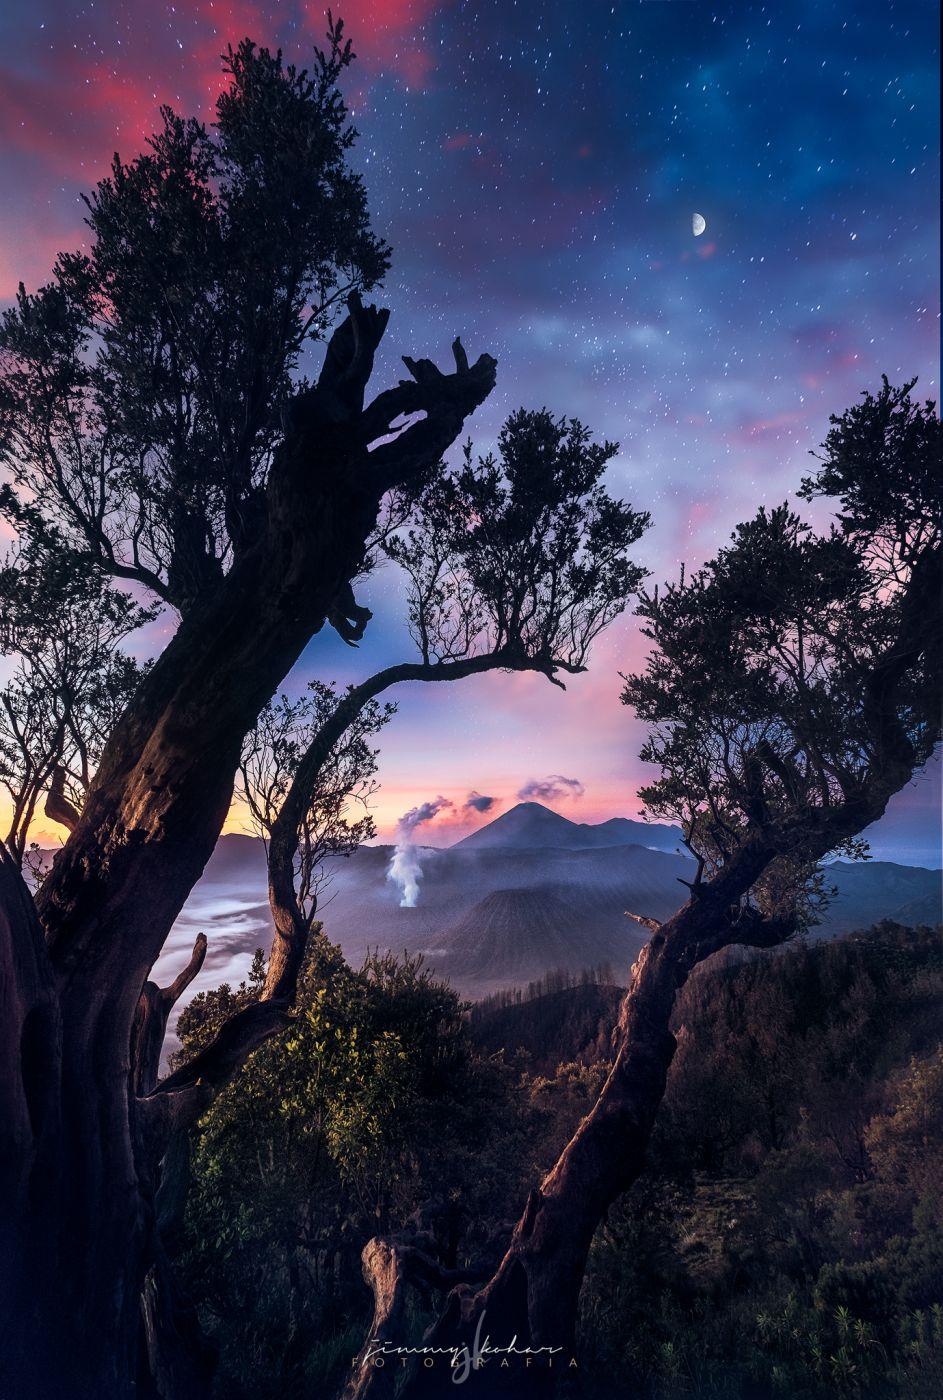 Stargazing in Bromo at Penanjakan 1, Indonesia